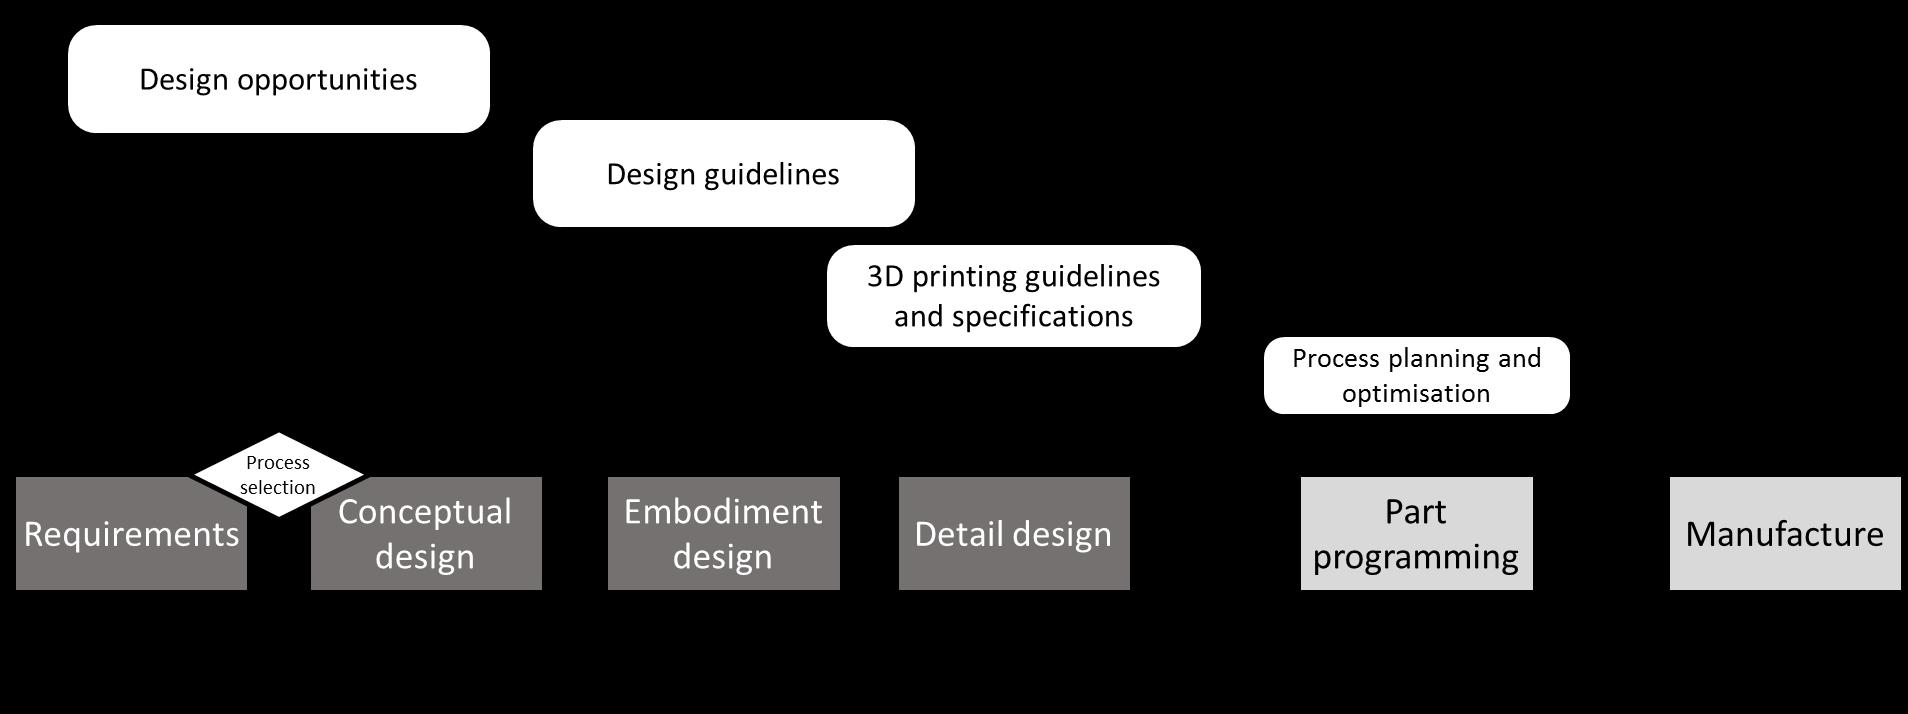 DfAM Simplified Framework